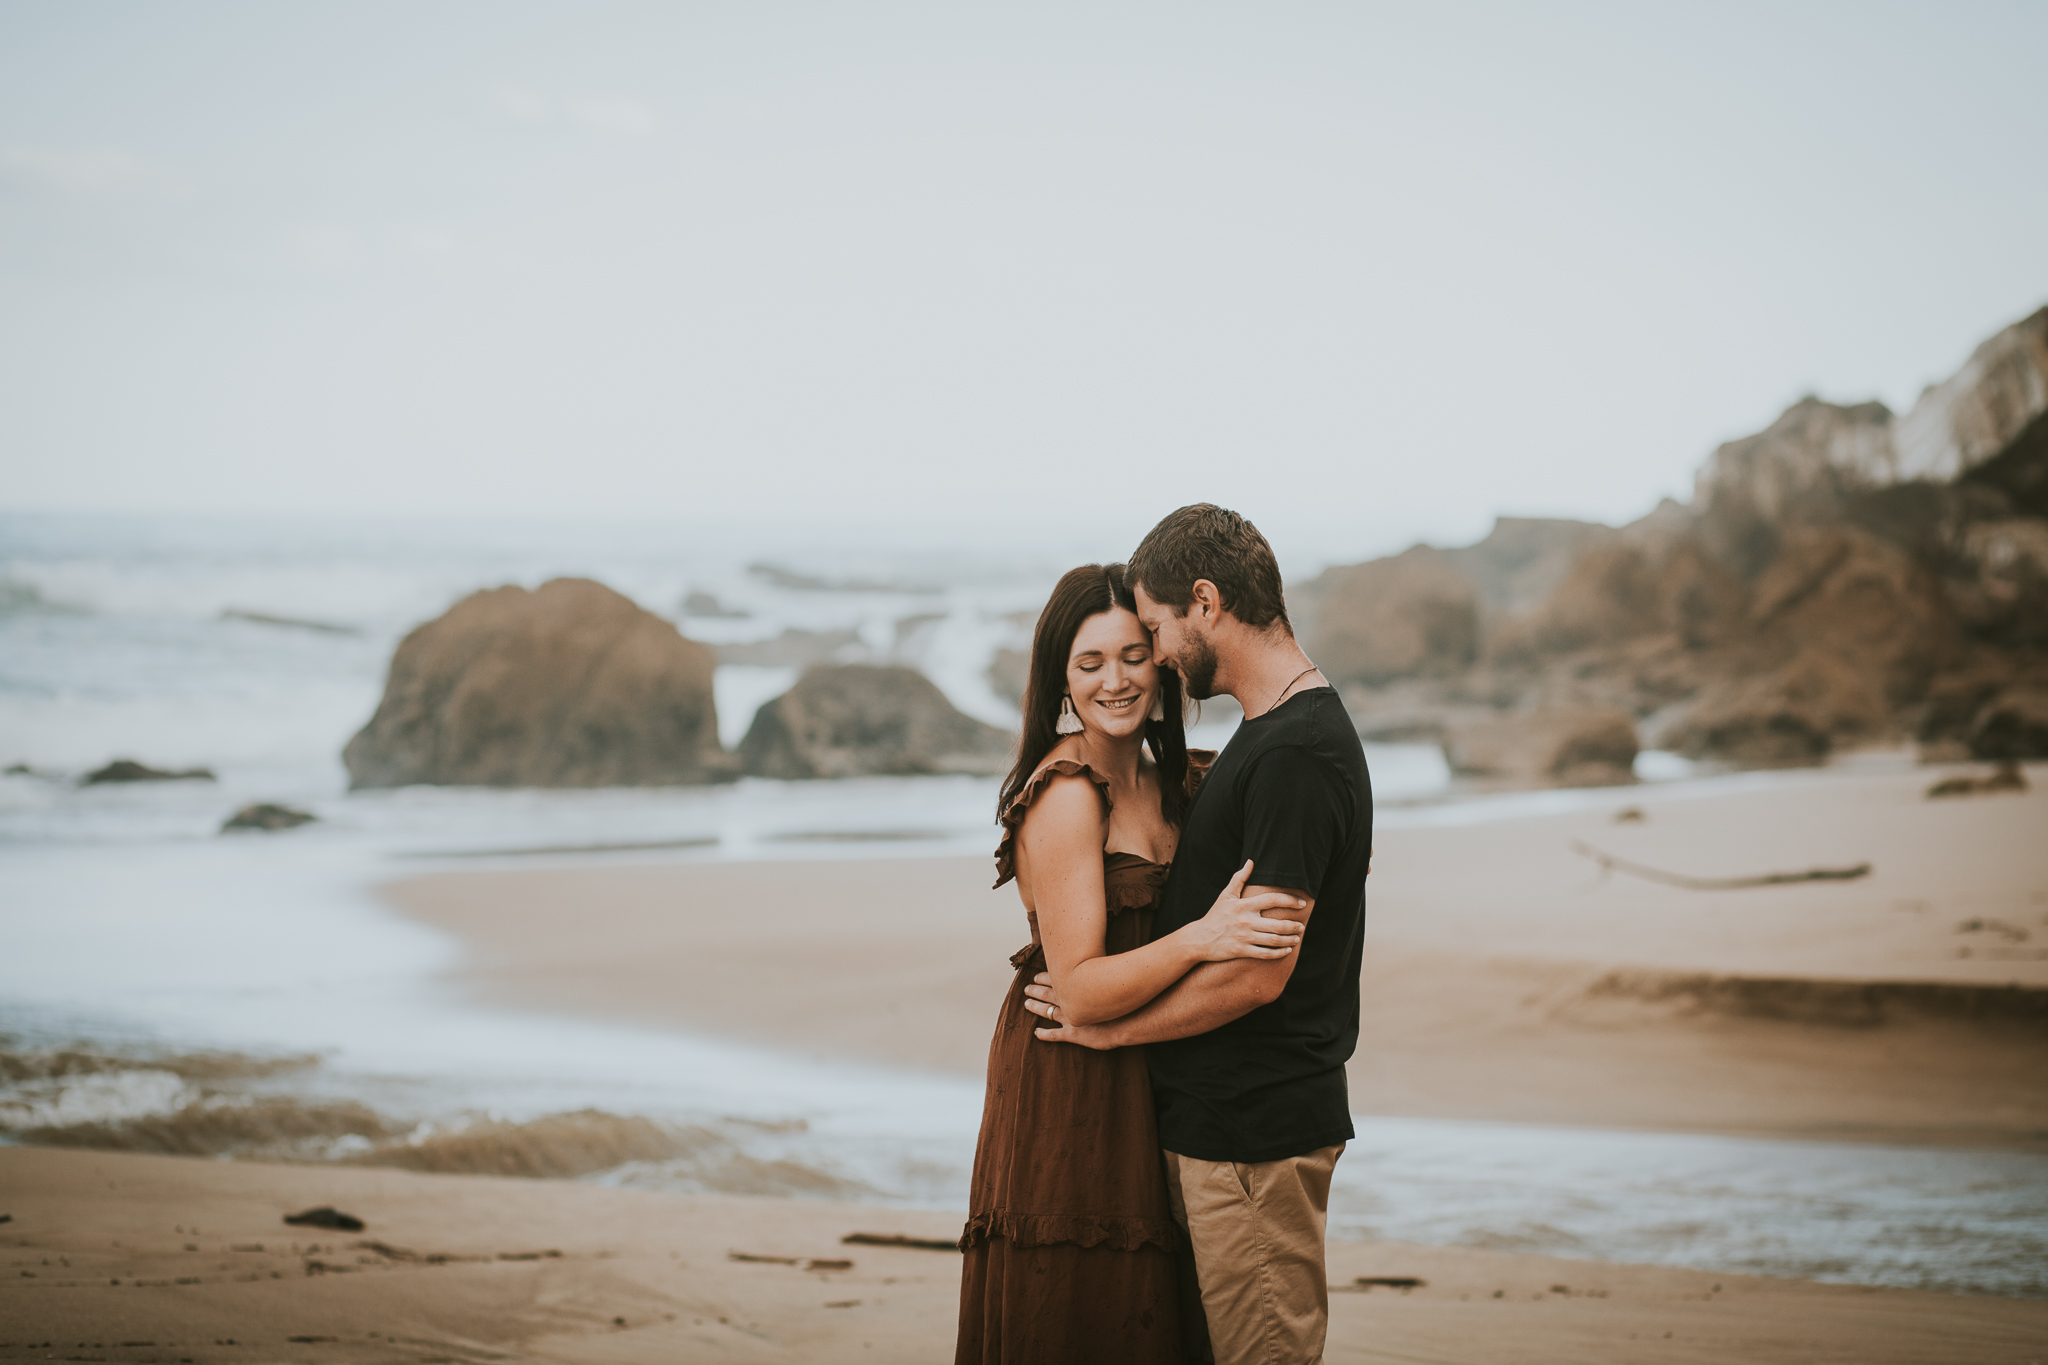 Nz Hawkes Bay Napier Wedding photographer waipatiki beach-49.jpg